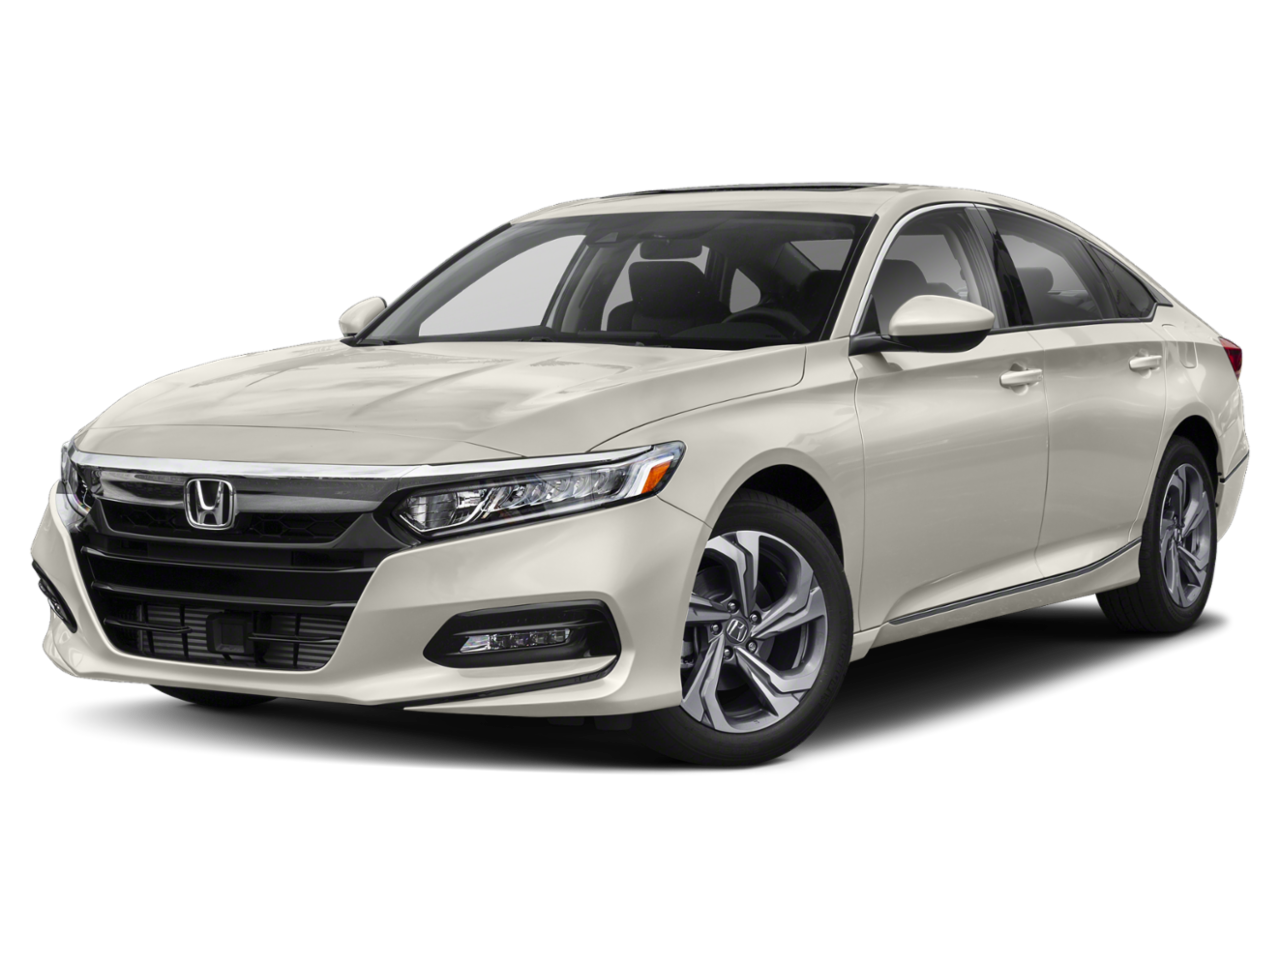 New 2020 Honda Accord Sedan EX 1.5T CVT